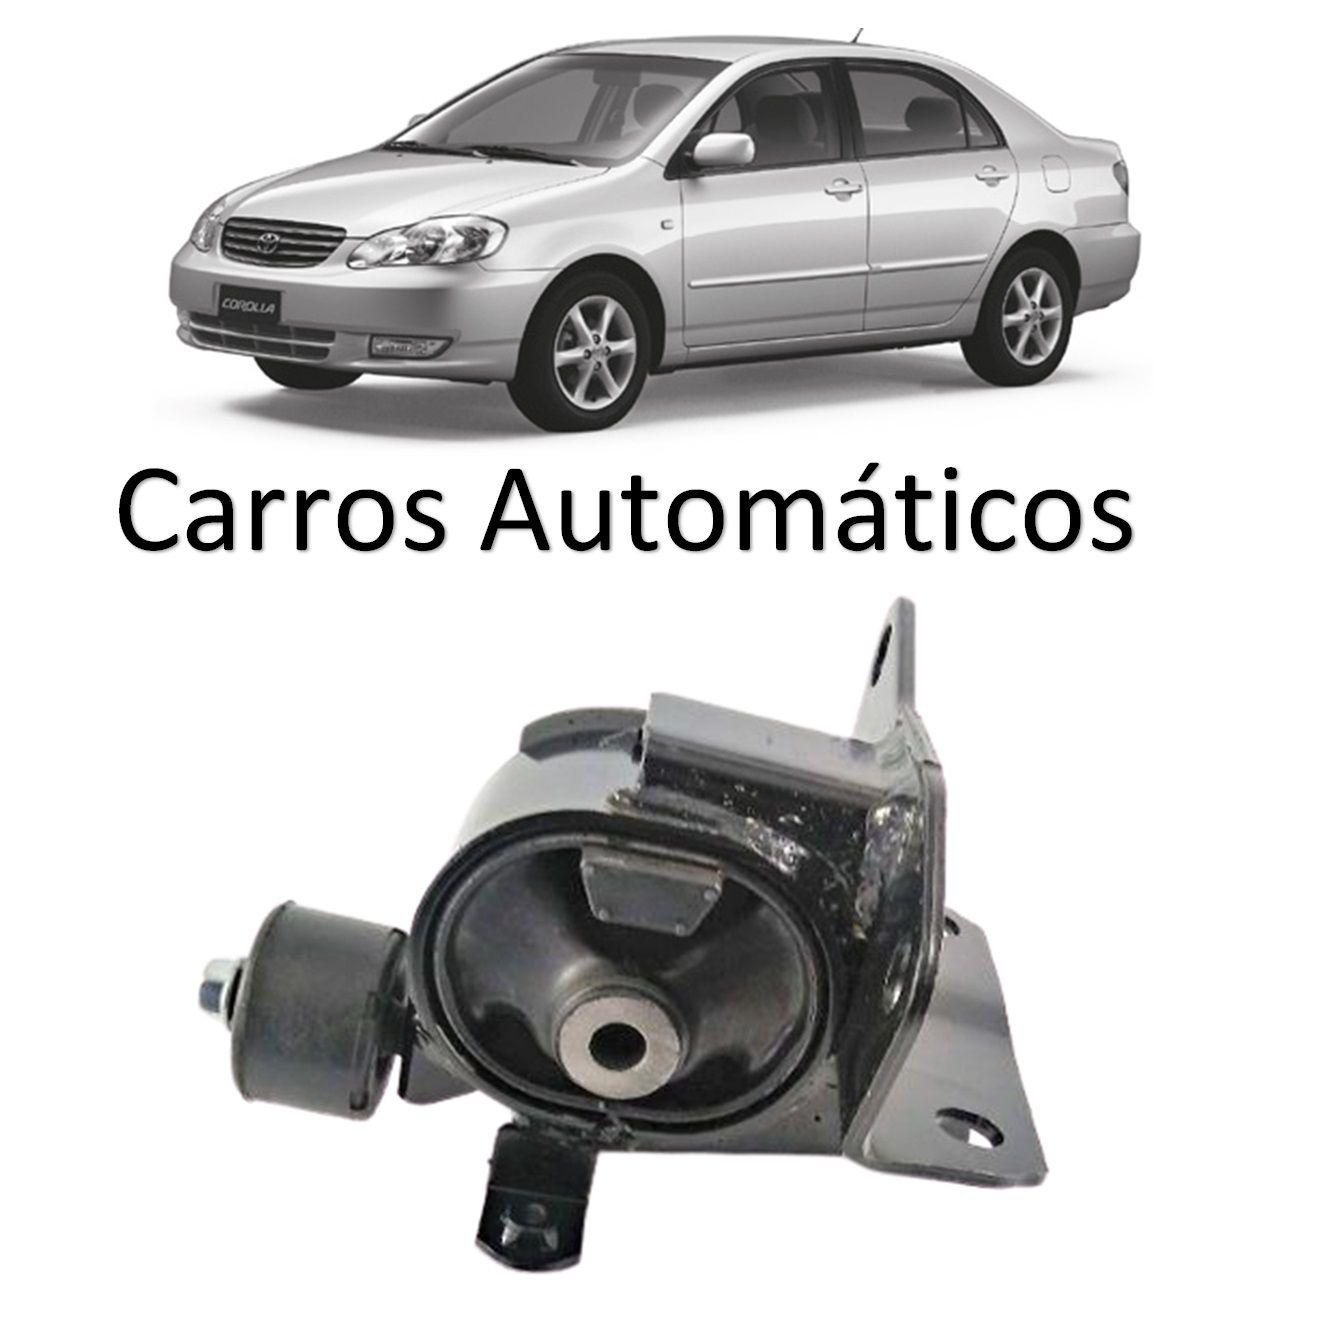 Calço Coxim Dianteiro Esquerdo Motor Corolla Fielder Automatico 2002 2003 2004 2005 2006 2007 2008